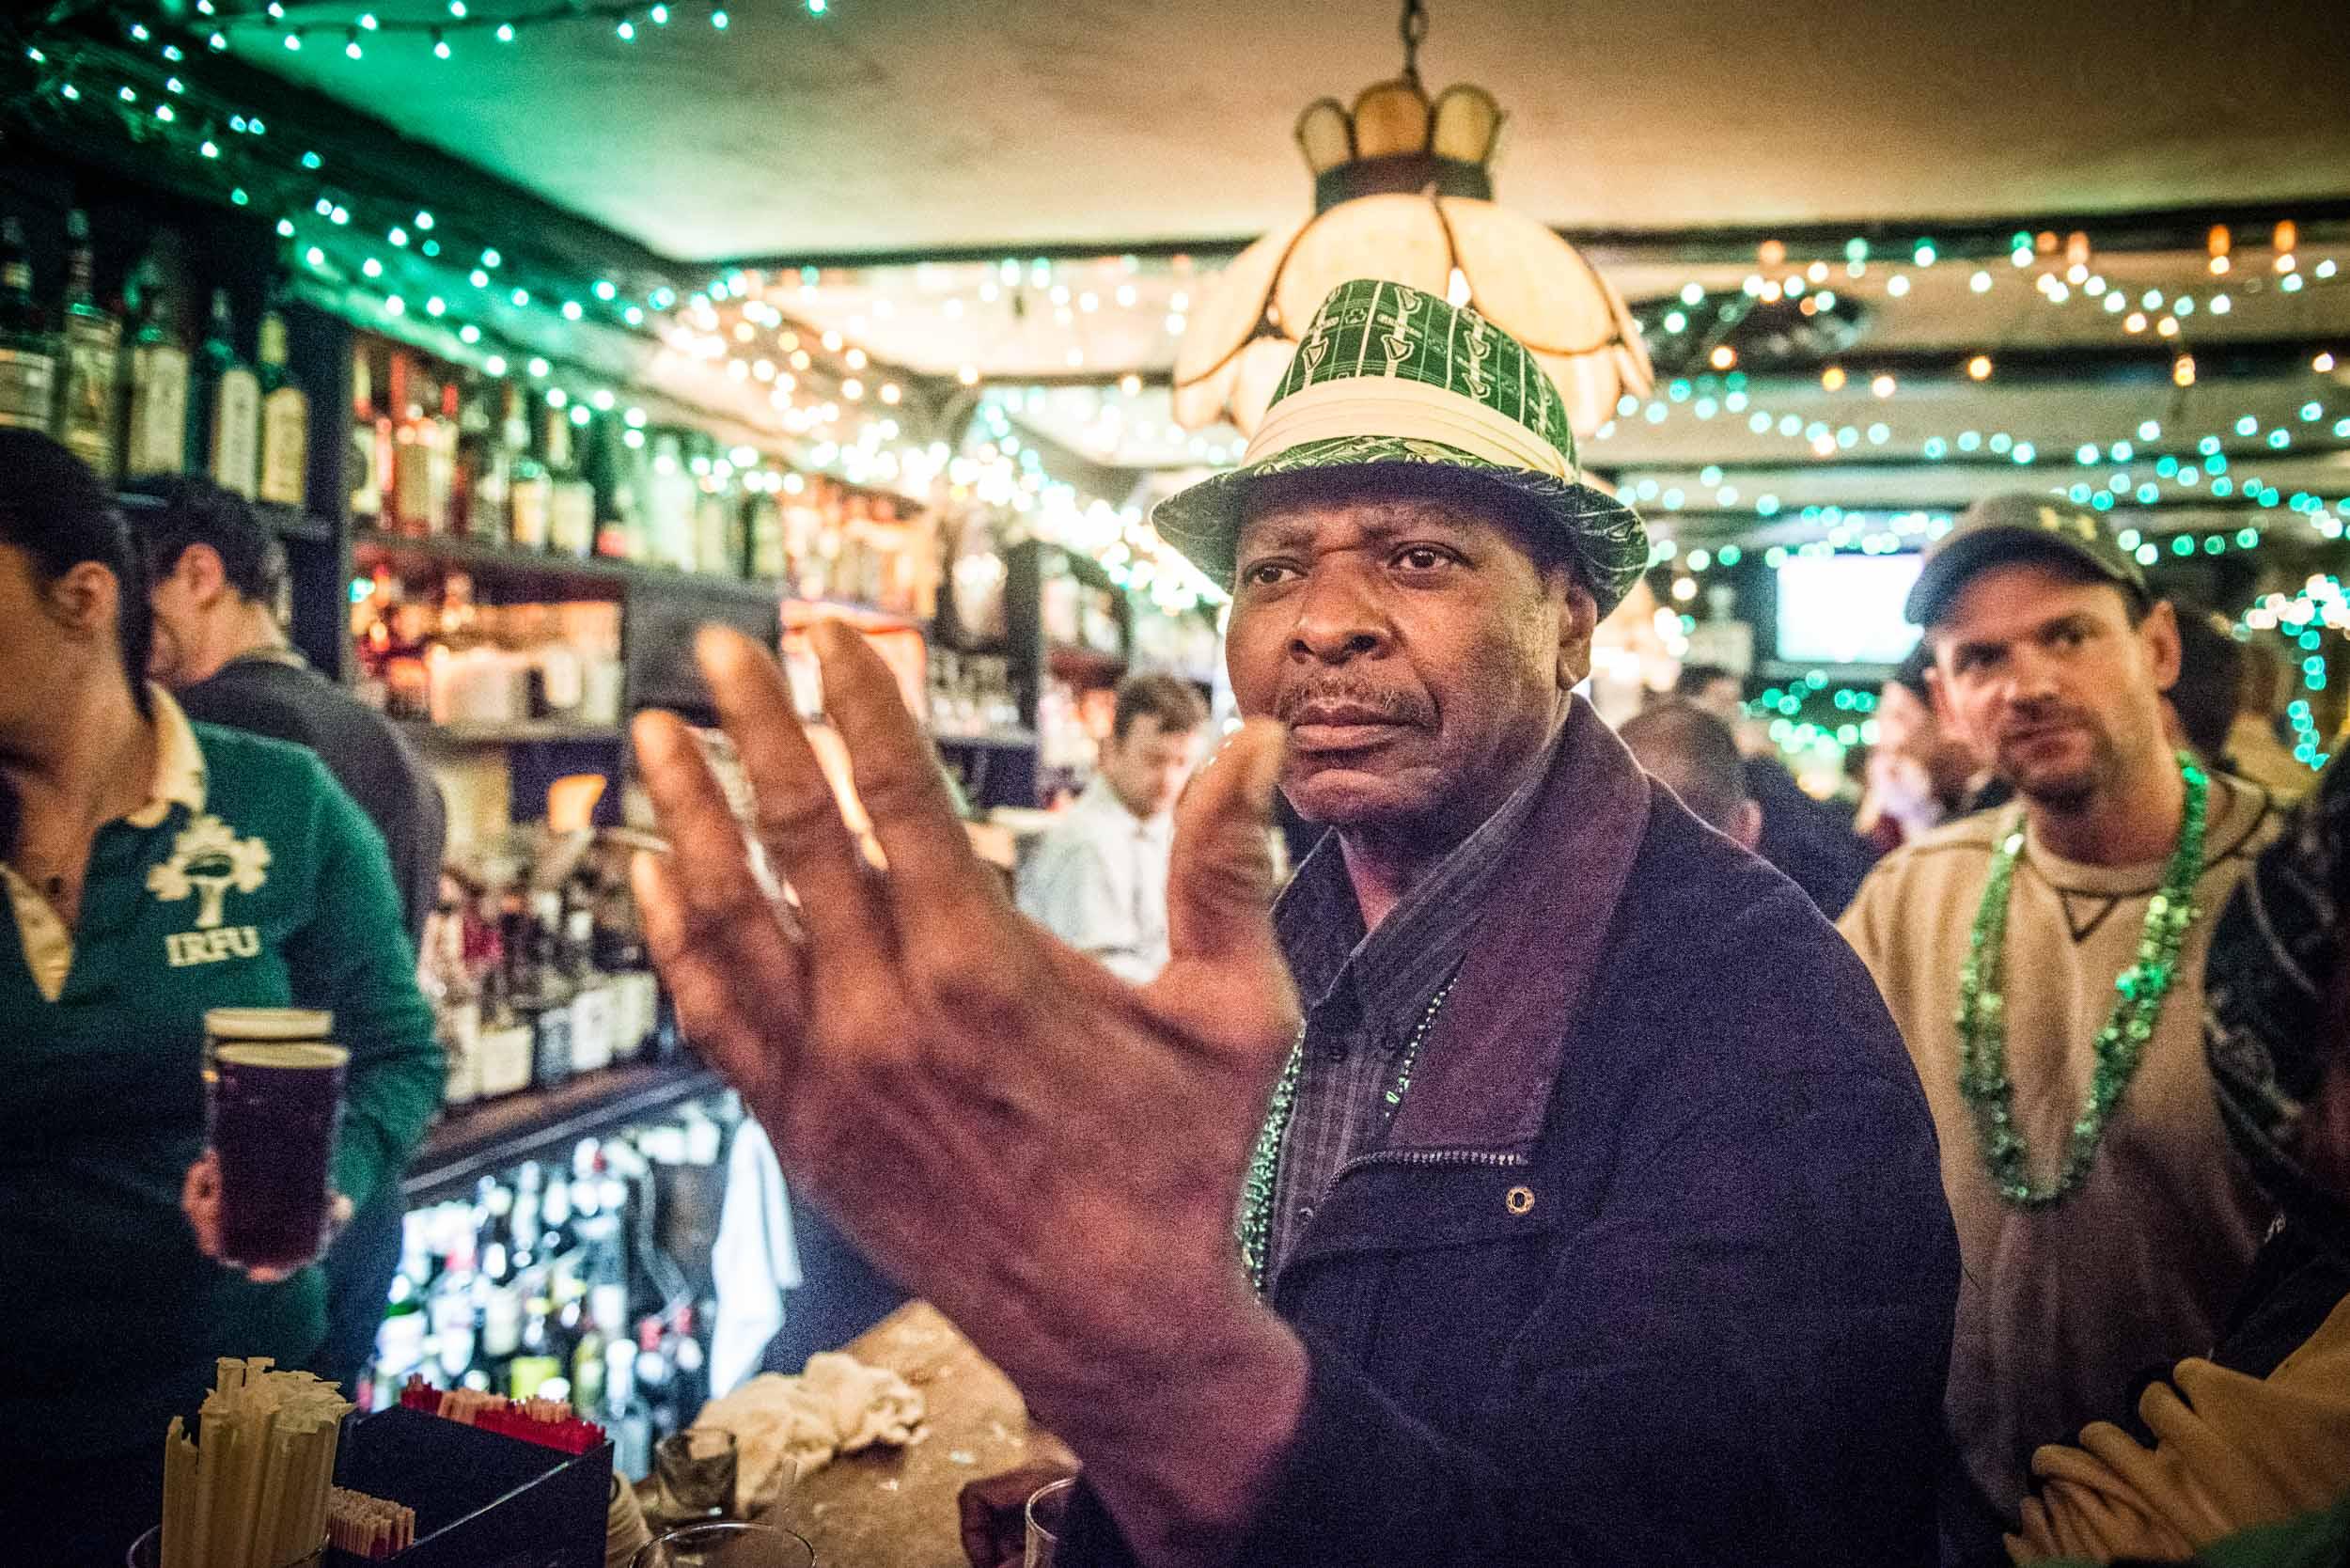 St Patricks day - Current events - Photo credit Nicola Bailey.jpg